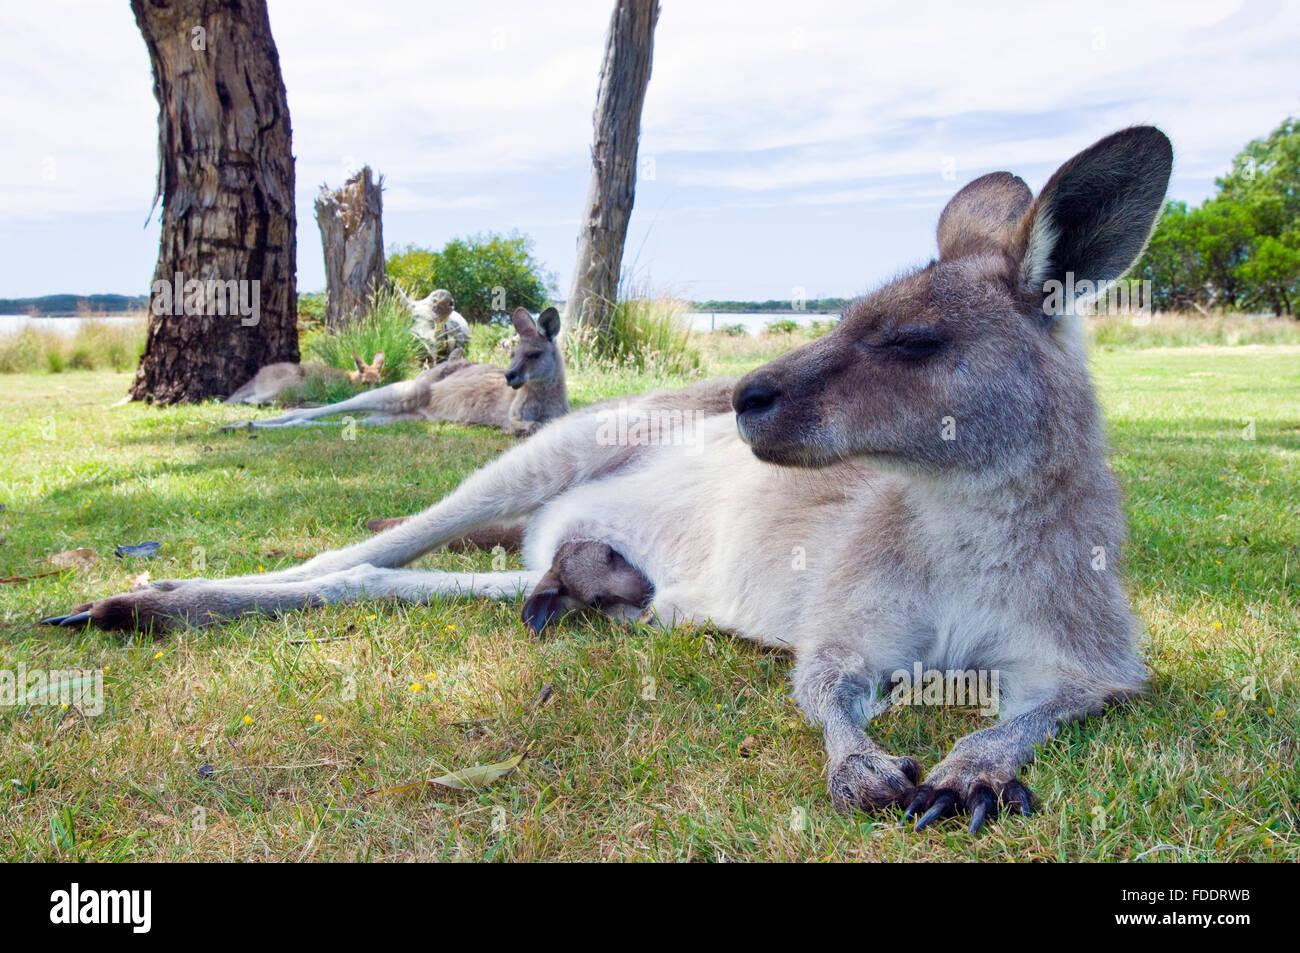 Forester kangaroo and joey in Tasmania, Australia - Stock Image